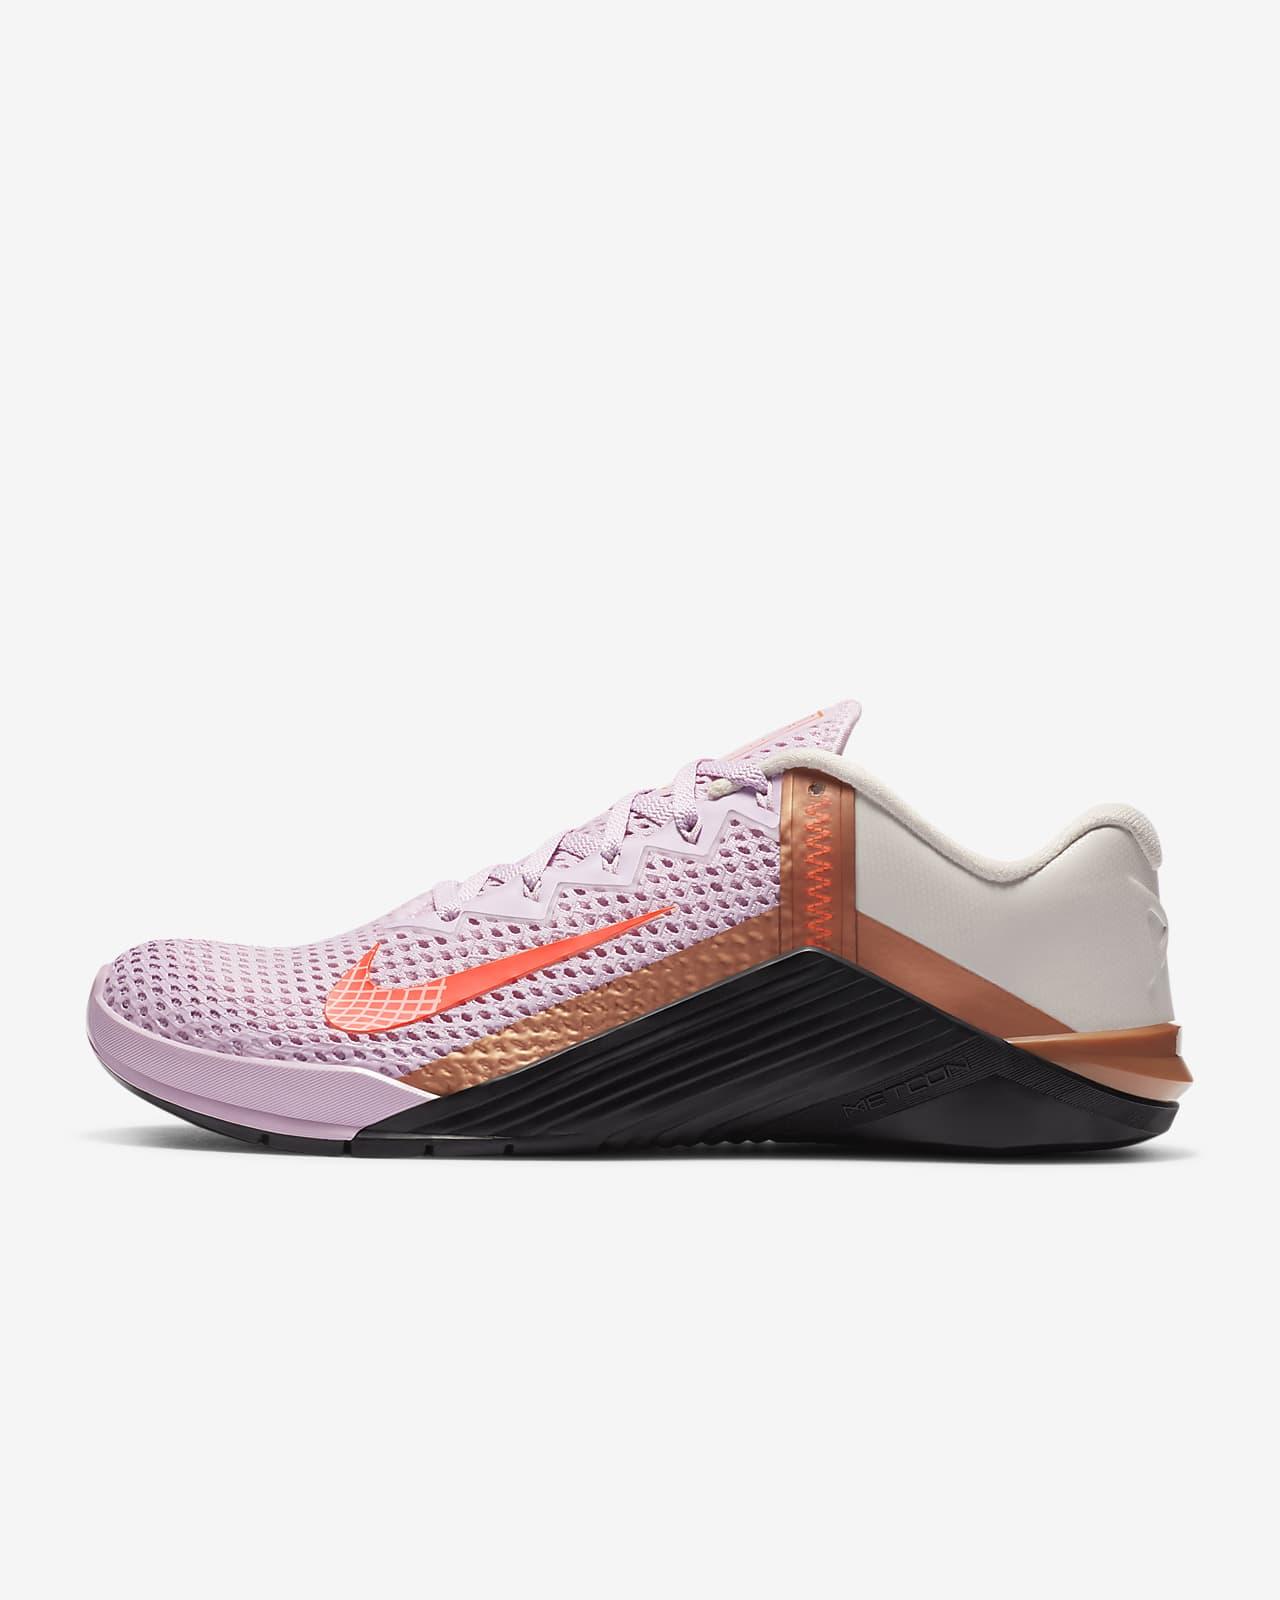 Sapatilhas de treino Nike Metcon 6 para mulher